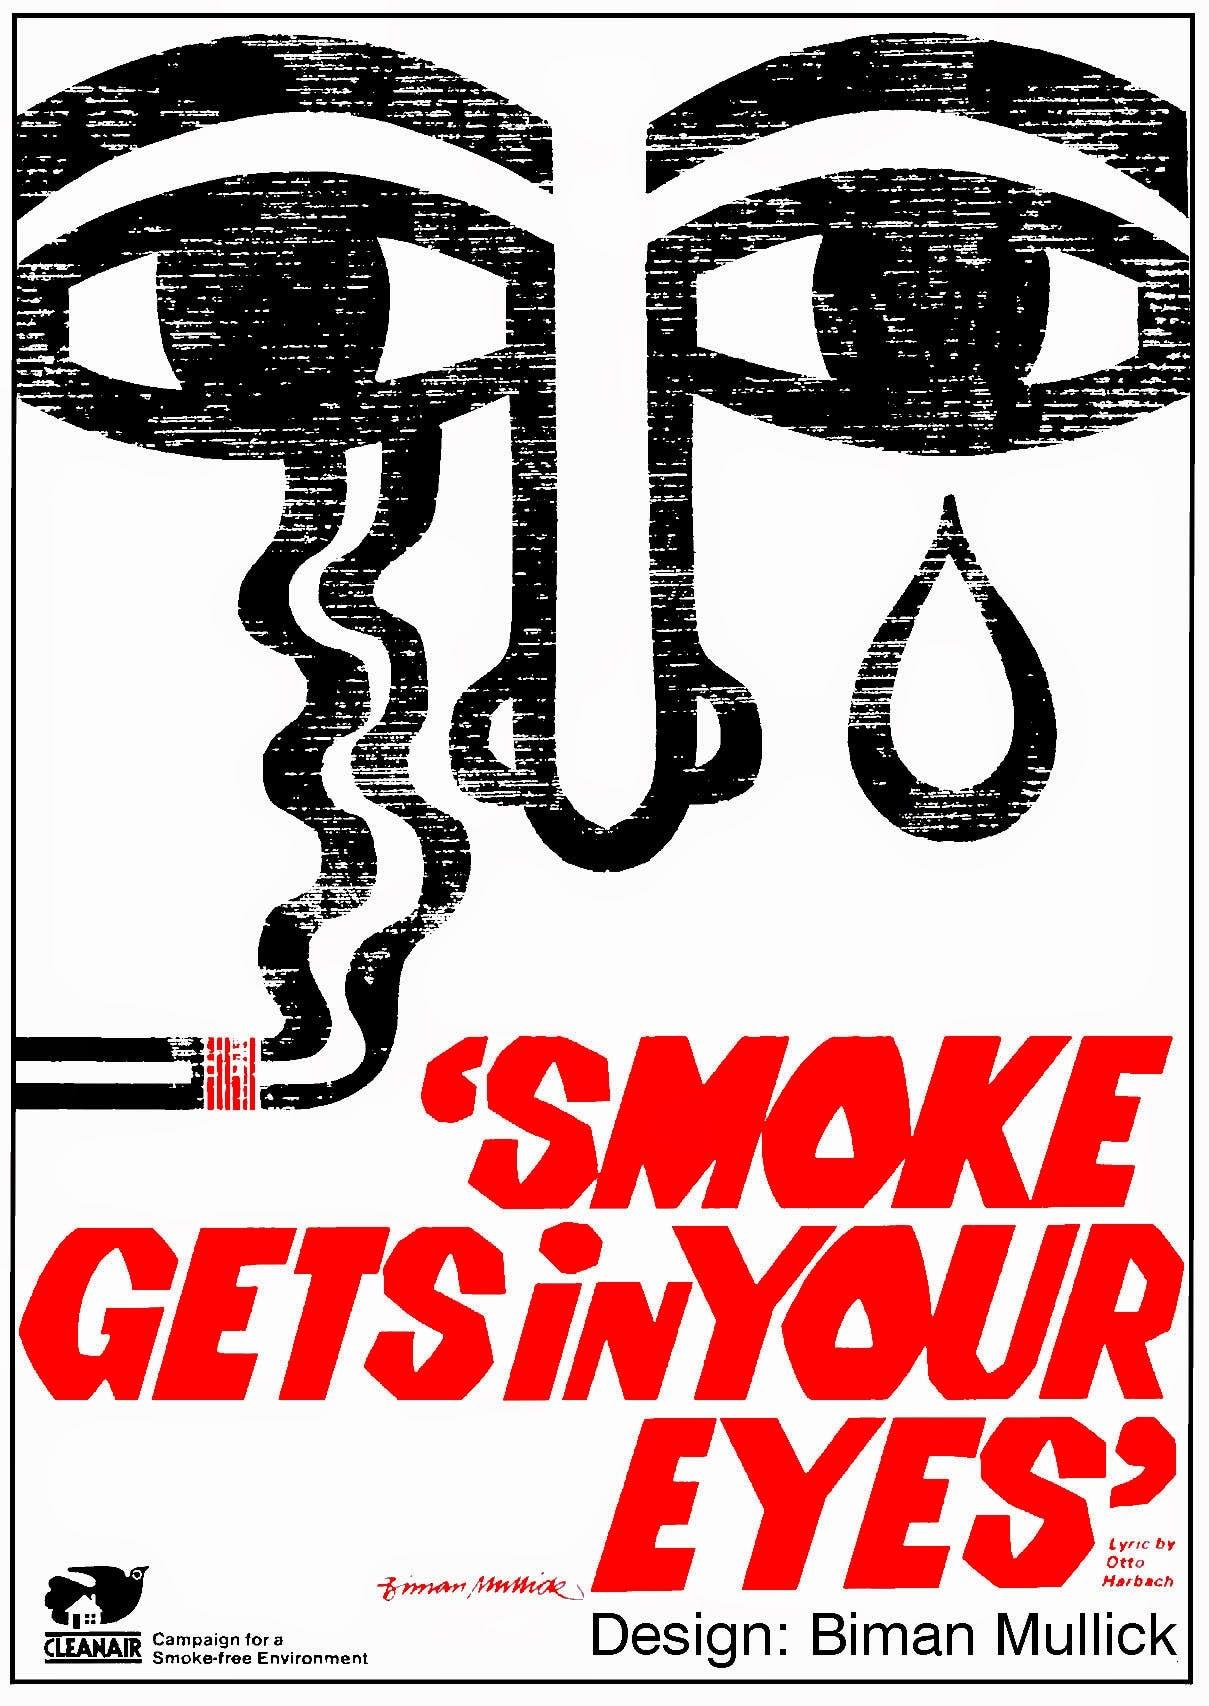 biman mullick s anti smoking posters